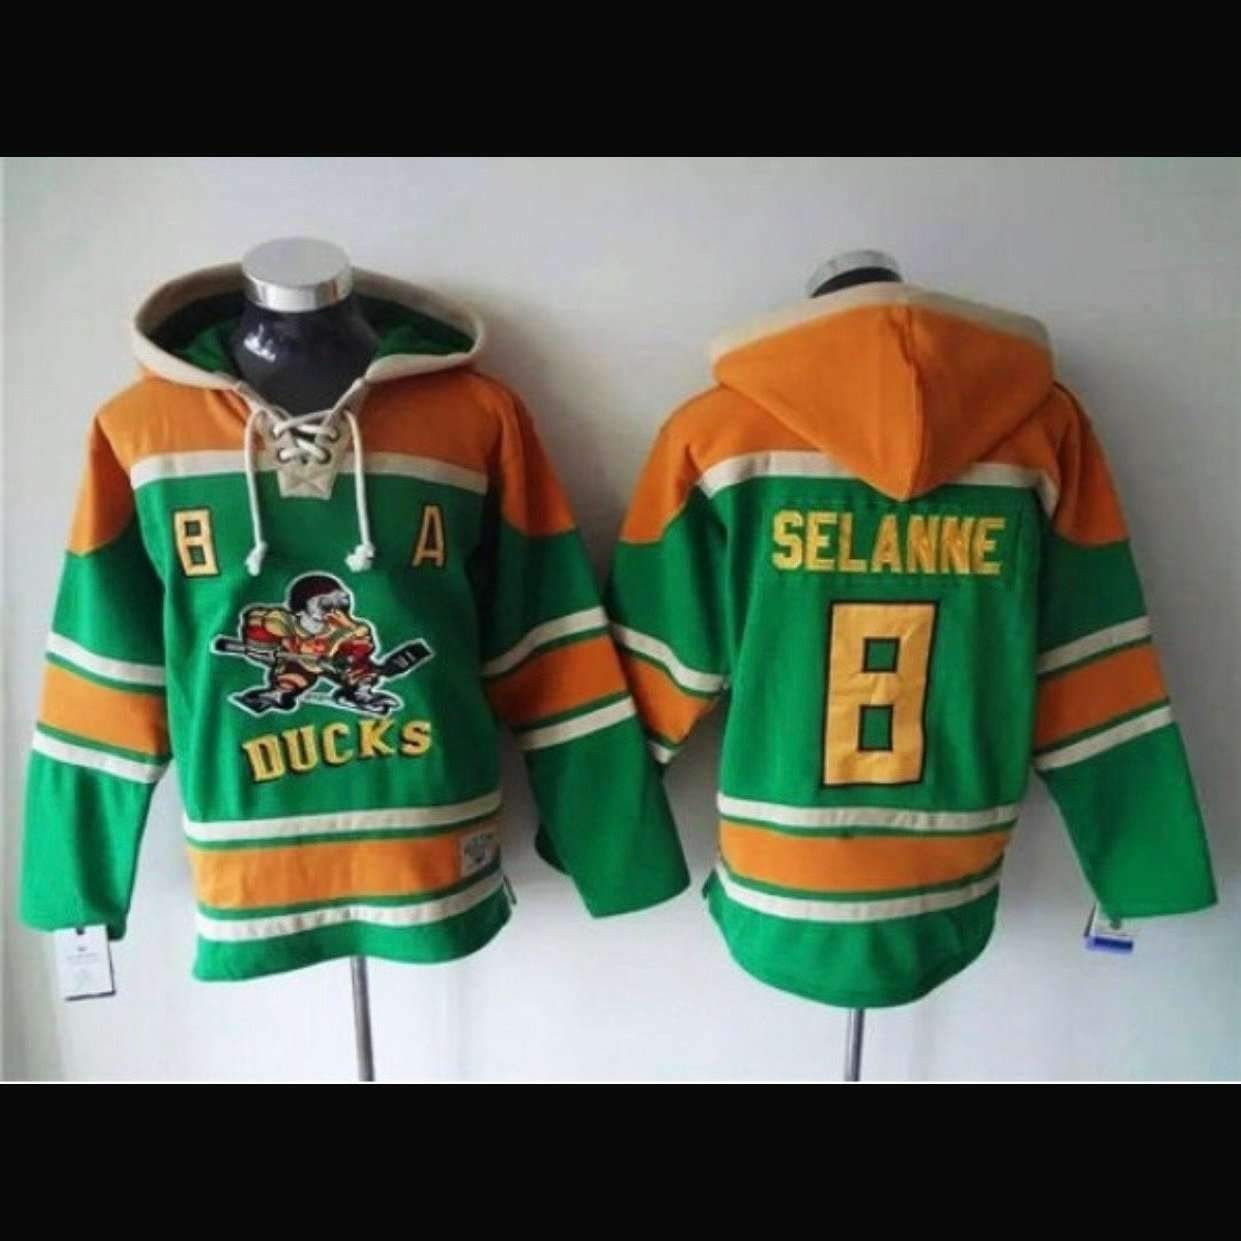 9dfaedf66ae Anaheim Ducks 15 Ryan GETZLAF Third Jersey | Anaheim Ducks Jerseys |  Anaheim Ducks, Nhl jerseys, NHL